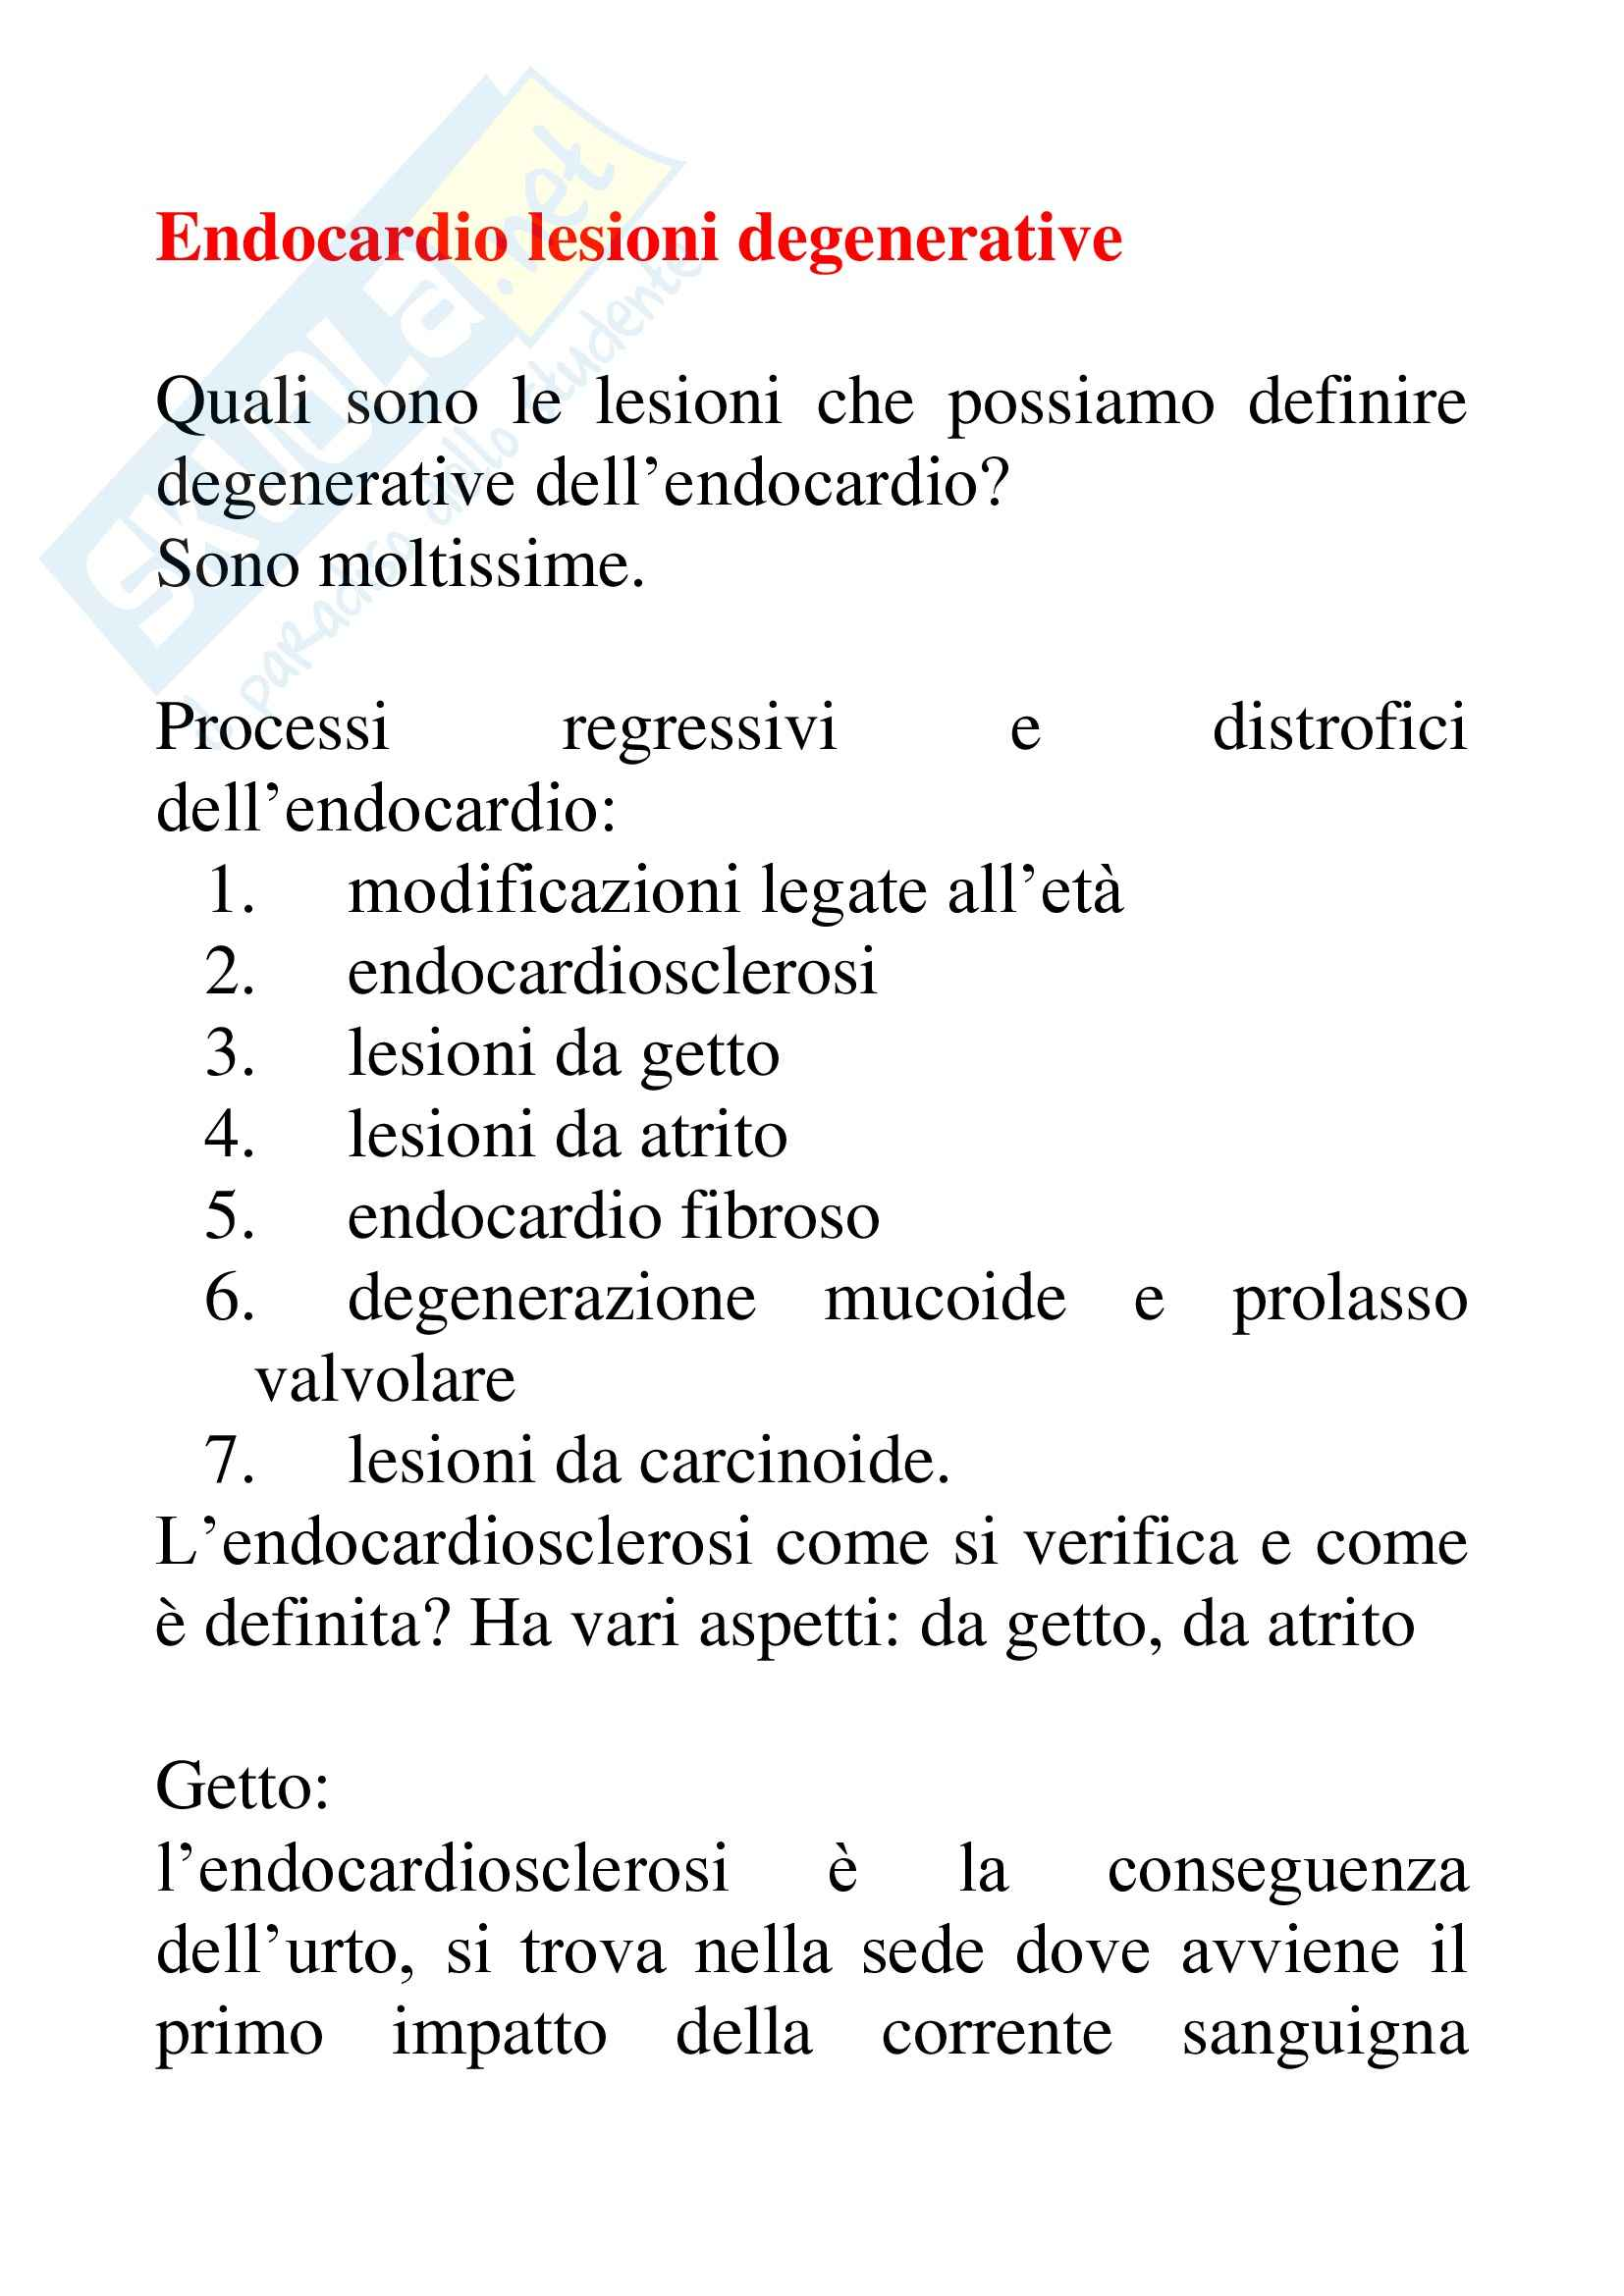 Anatomia patologica - endocardio lesioni degenerative